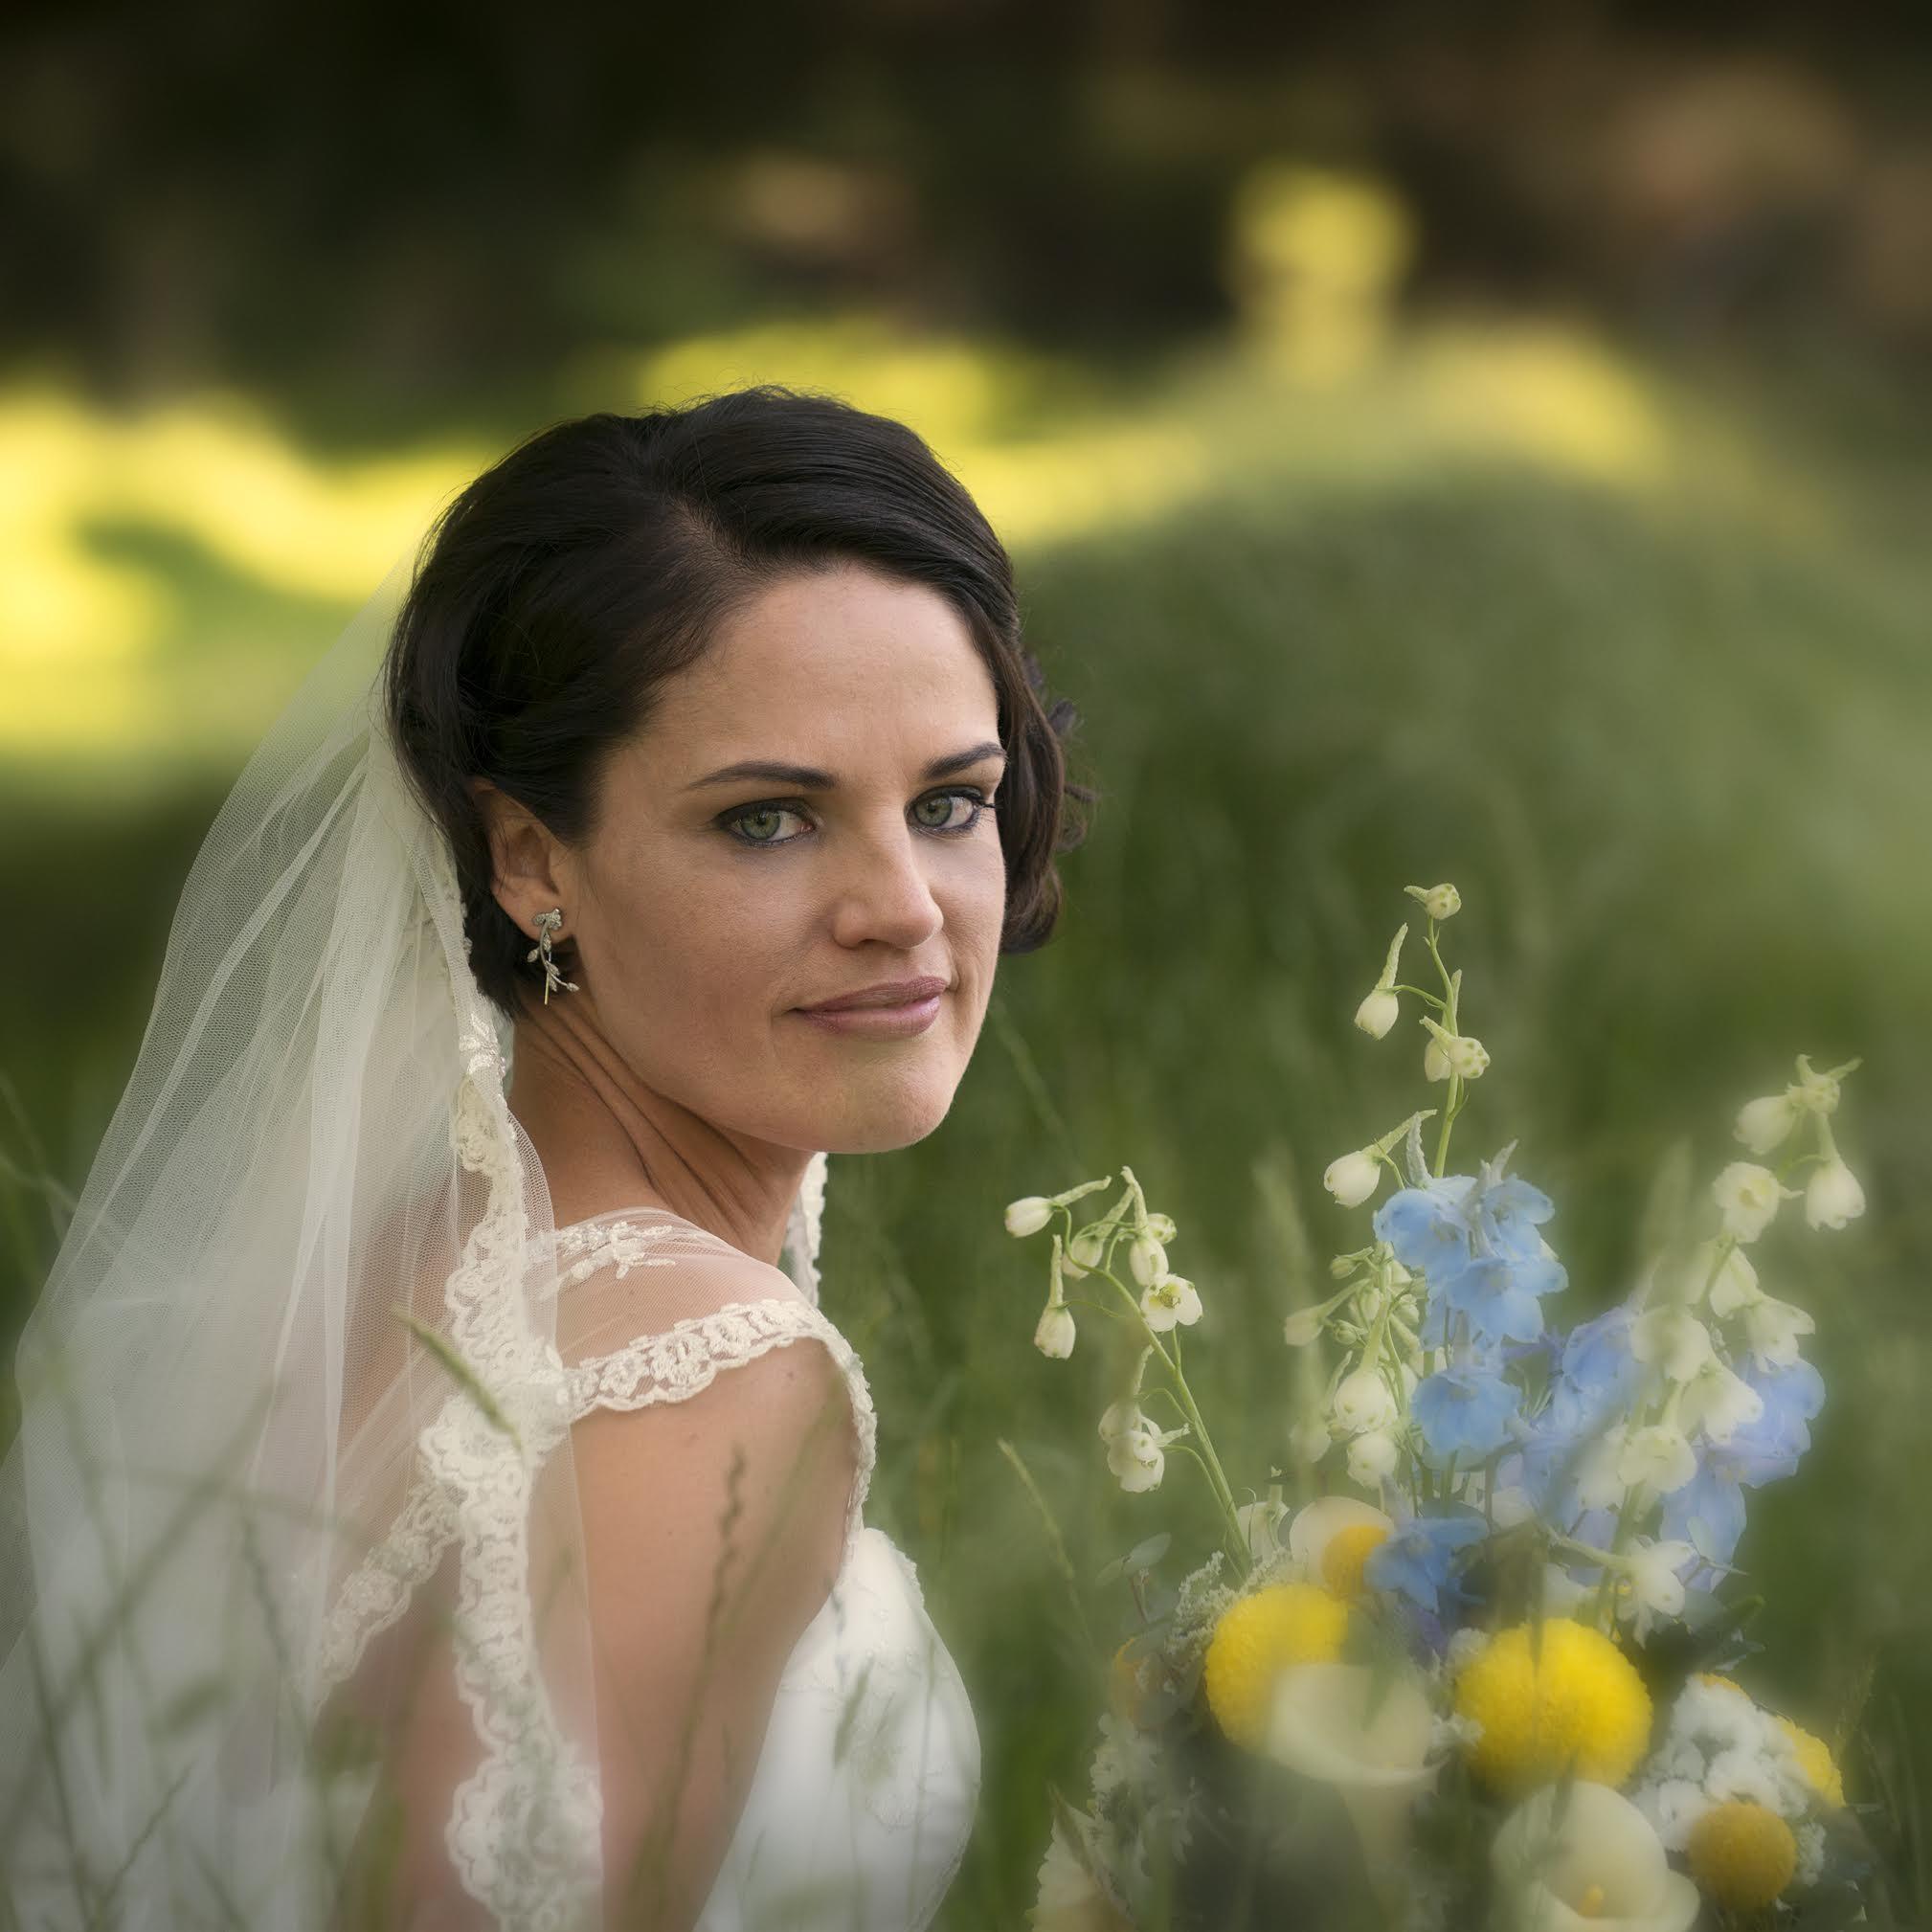 Tony Carter Photography Weddings Homepage 1.jpg